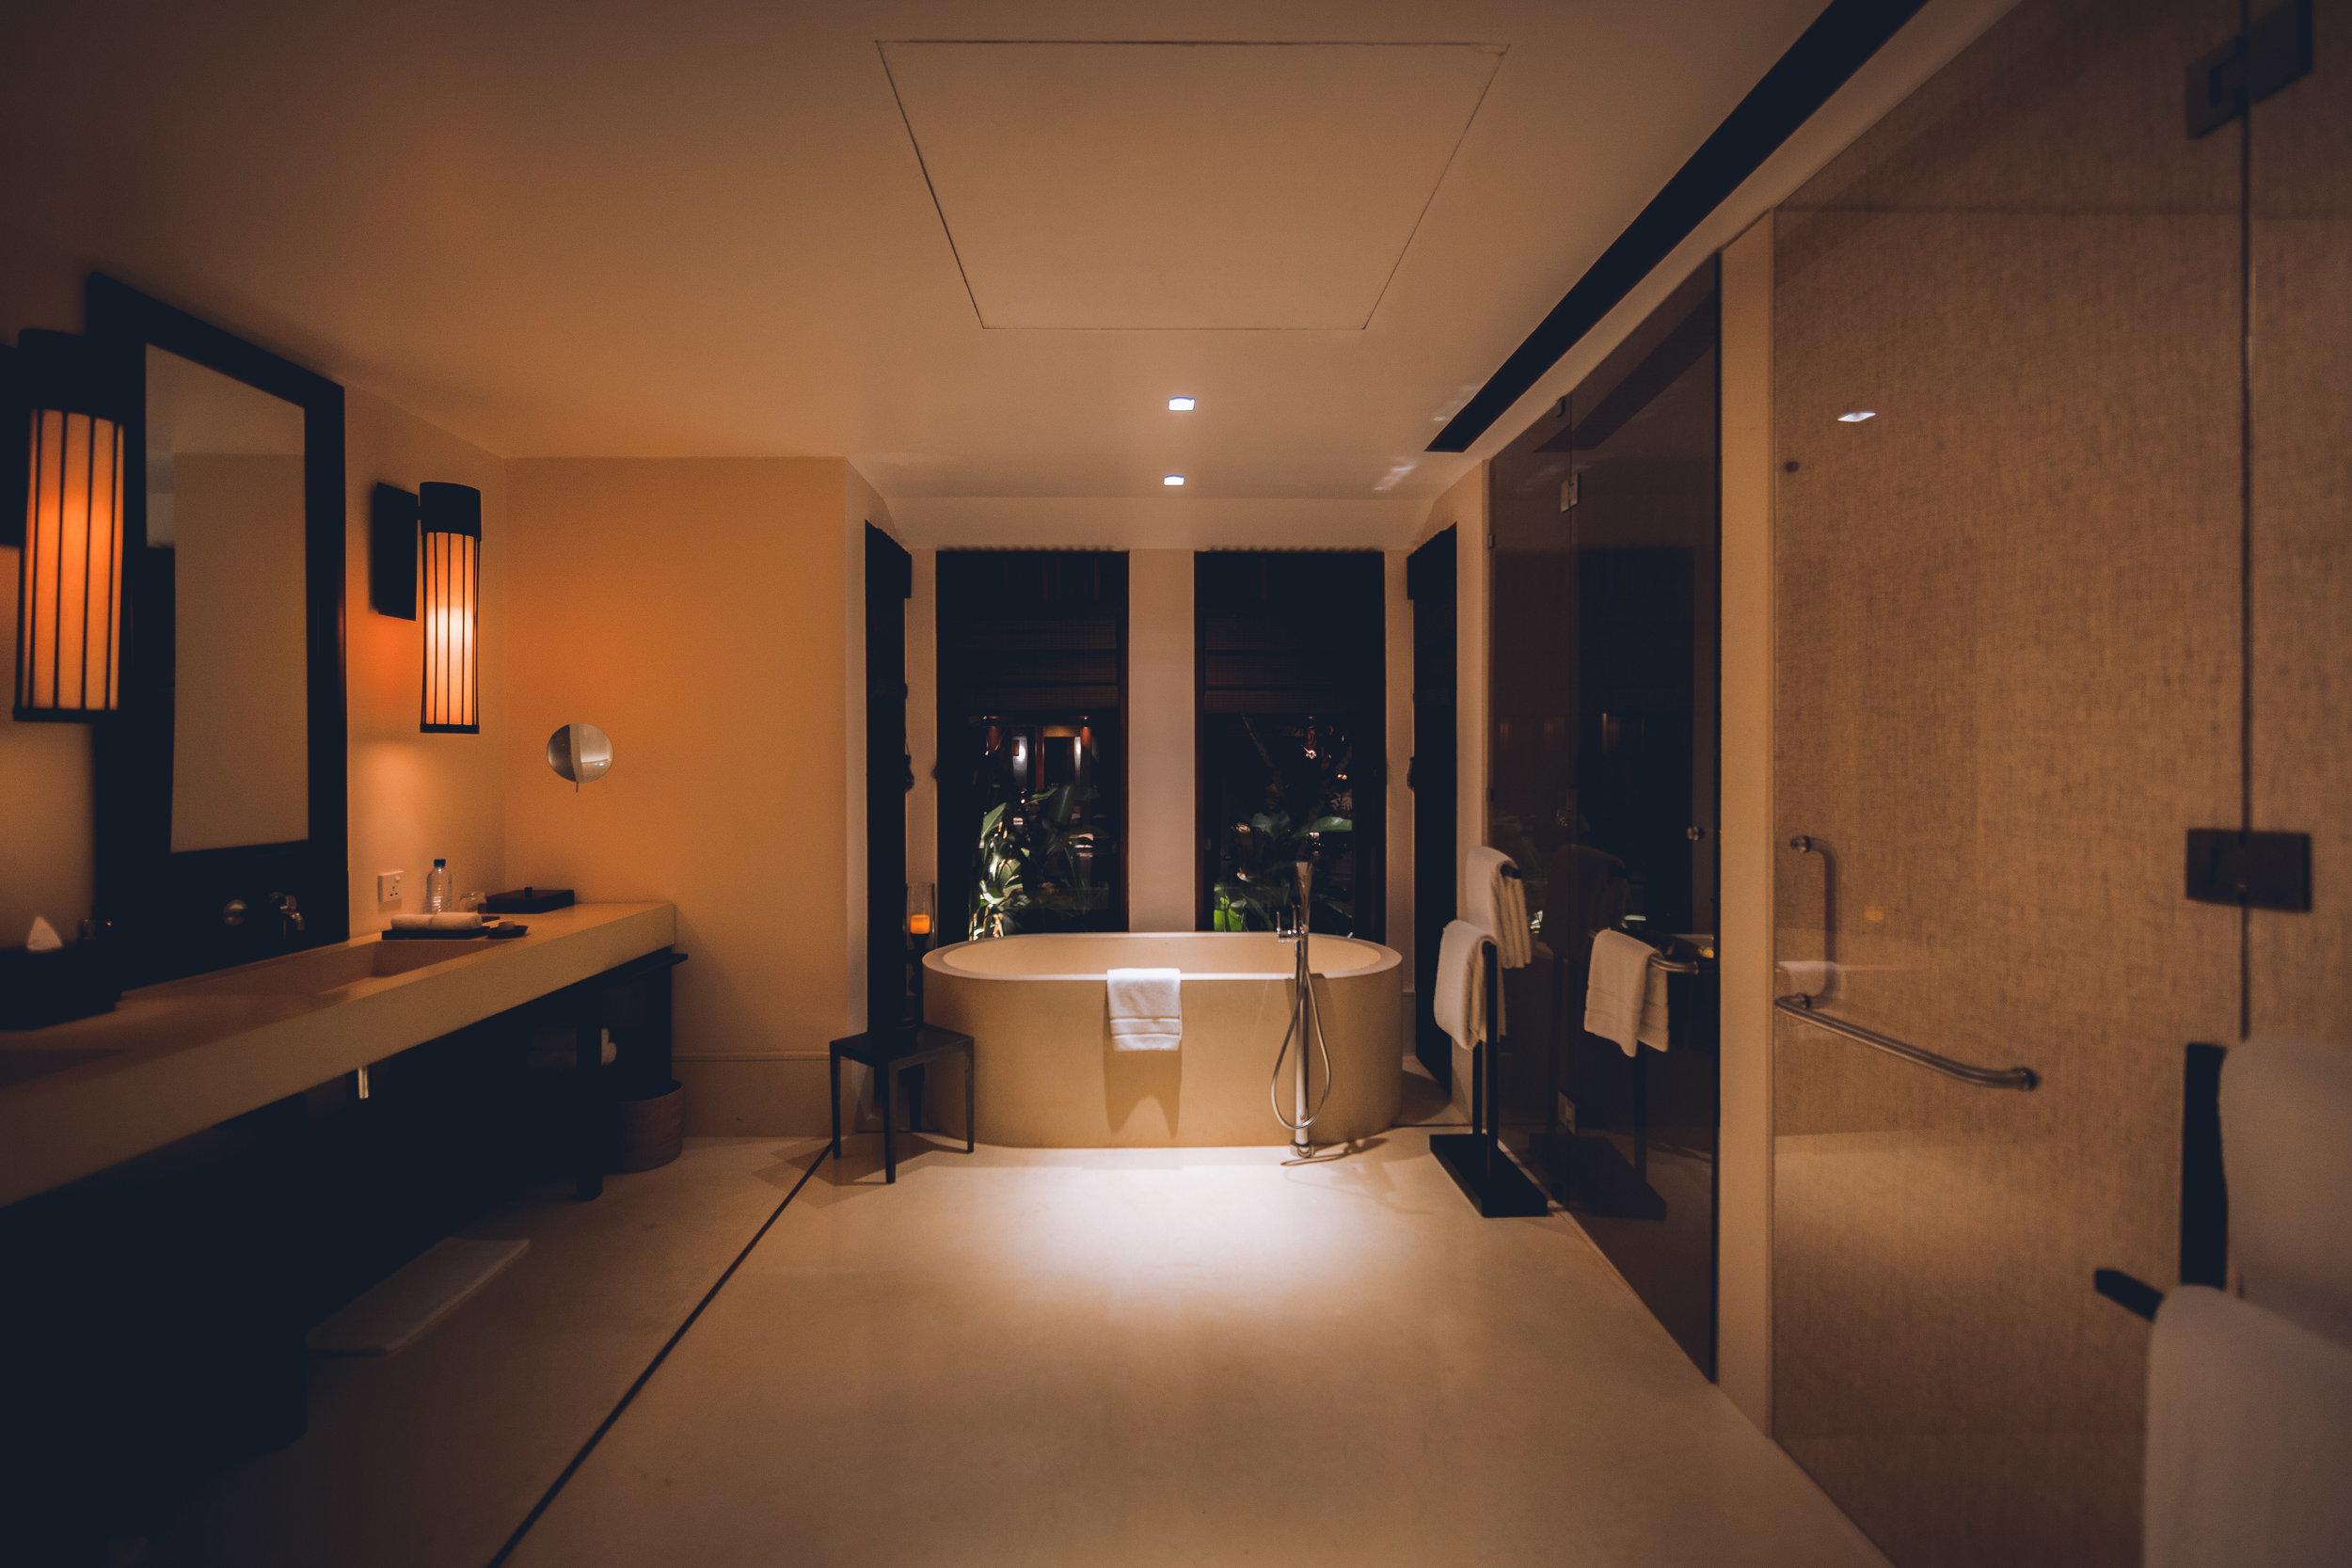 room-0044.jpg